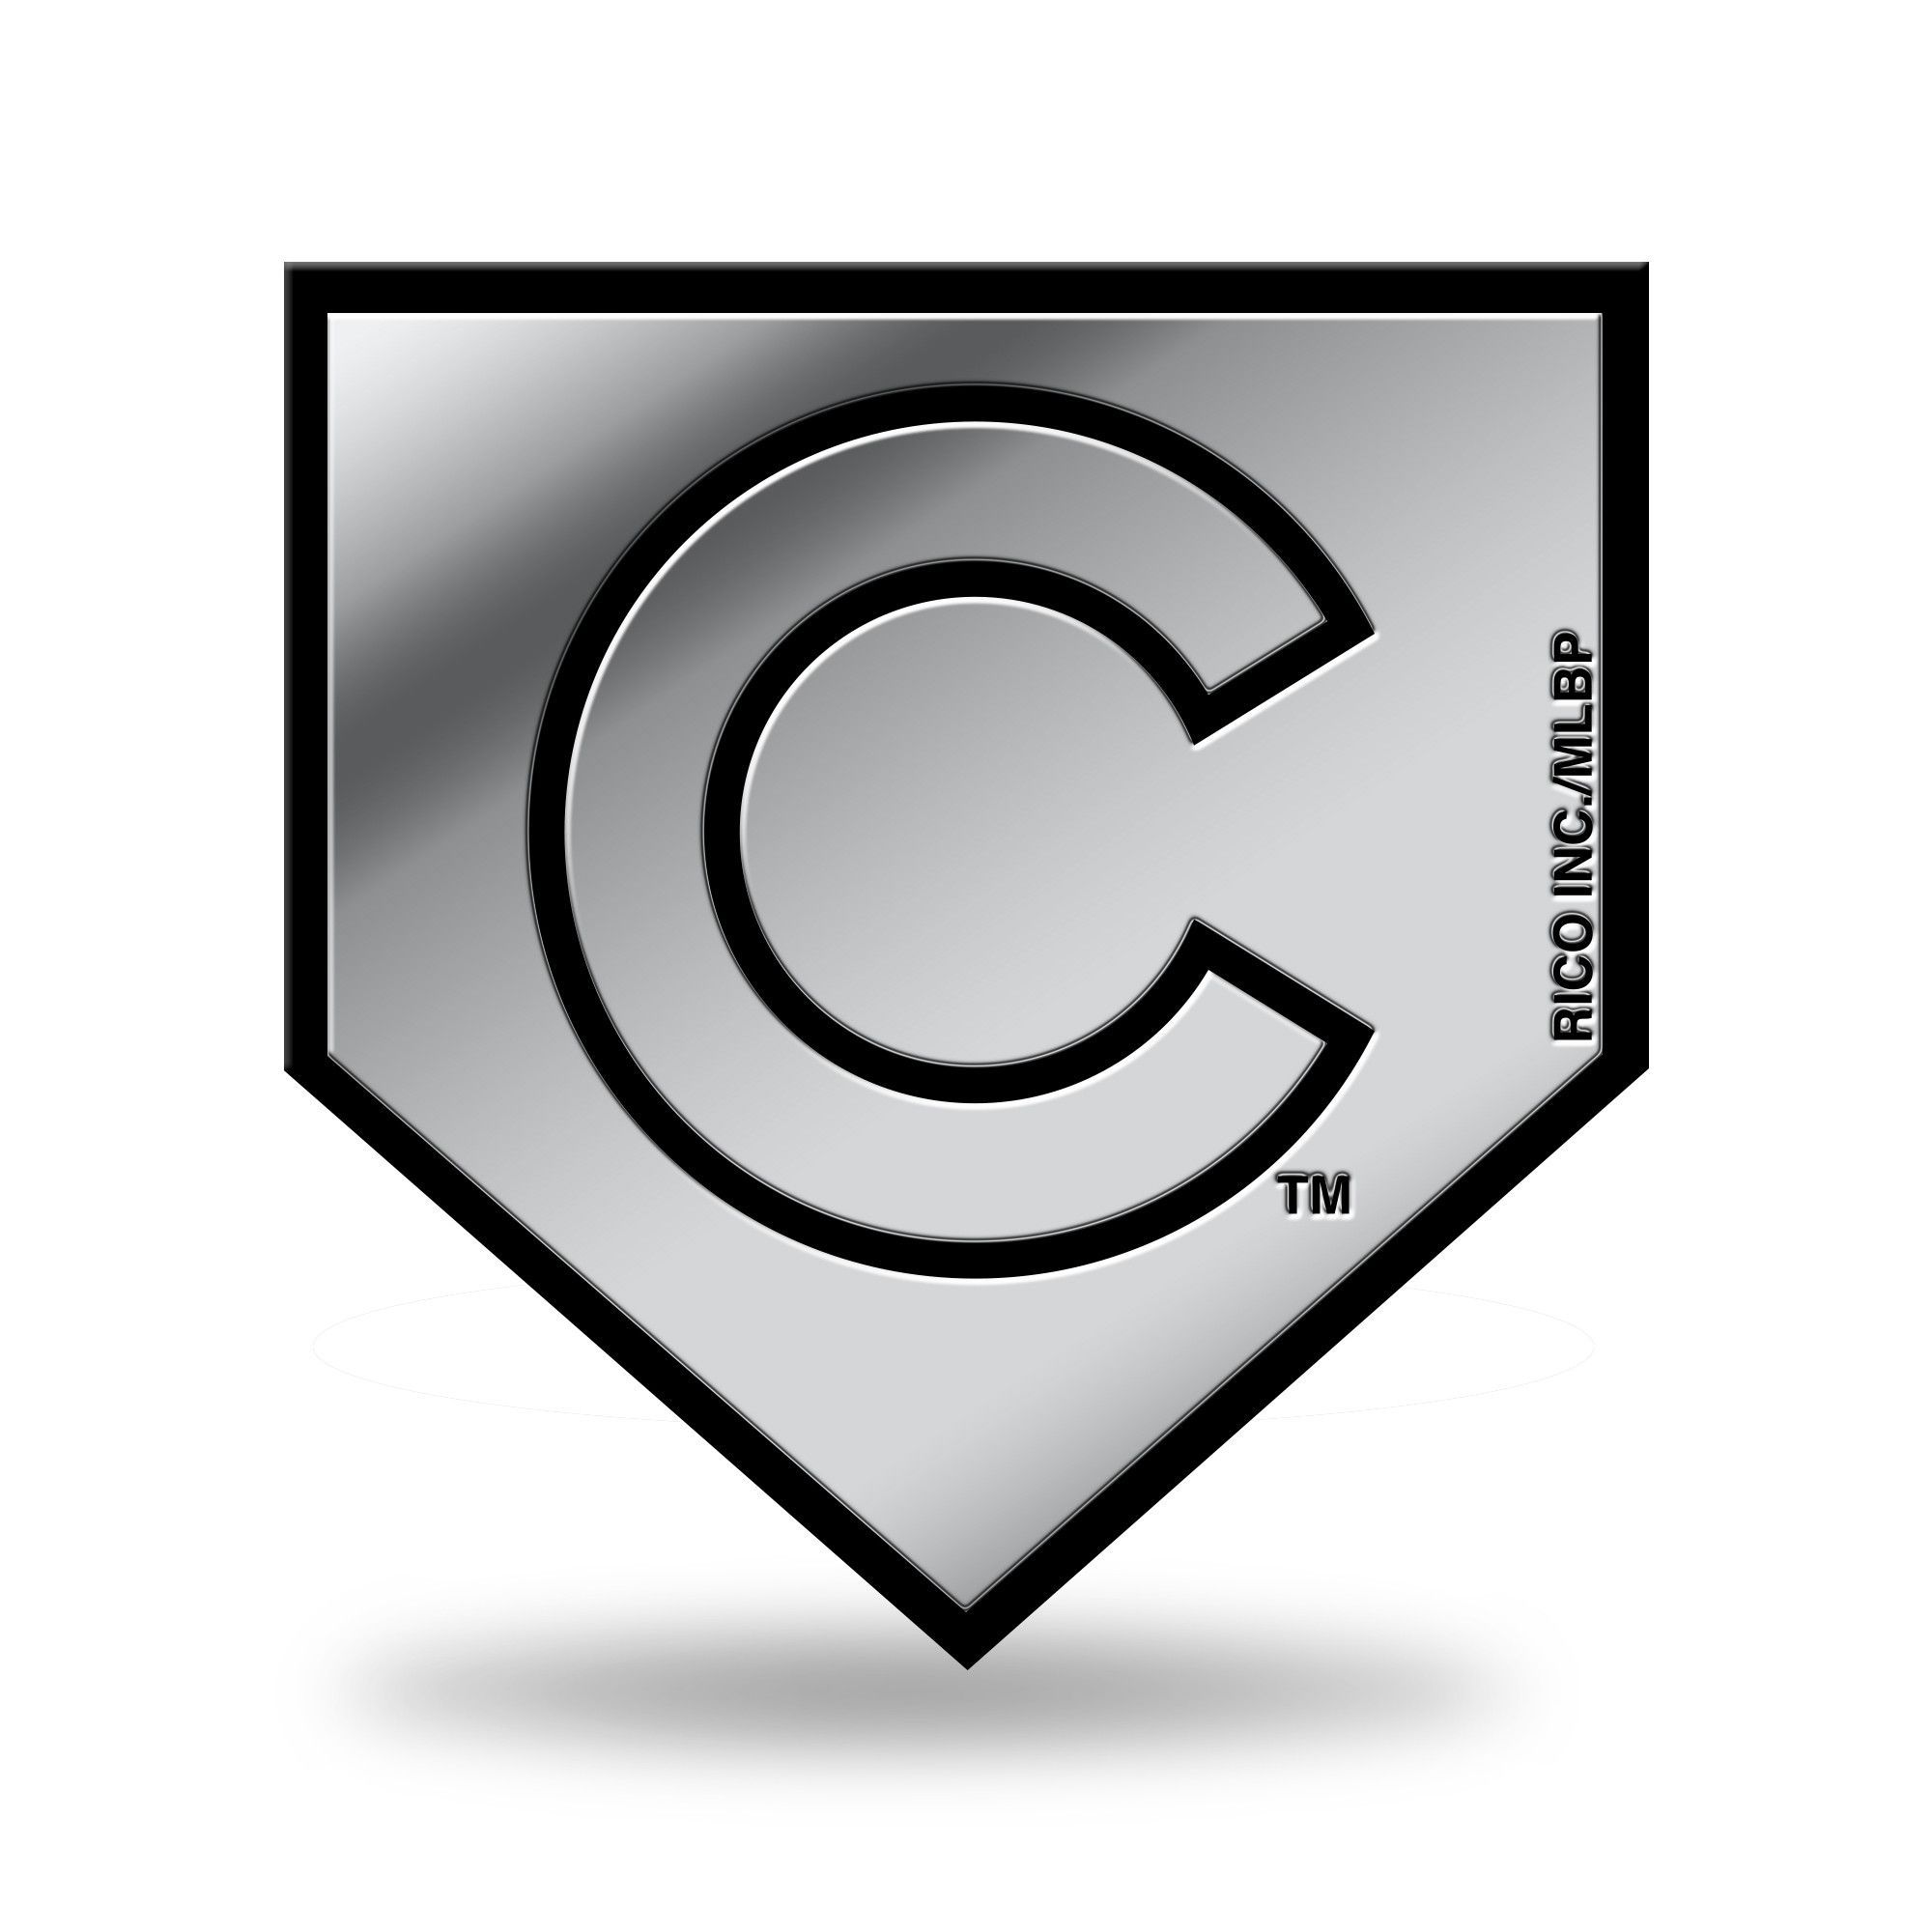 chicago cubs logo 3d home plate chrome decal sticker new truck car